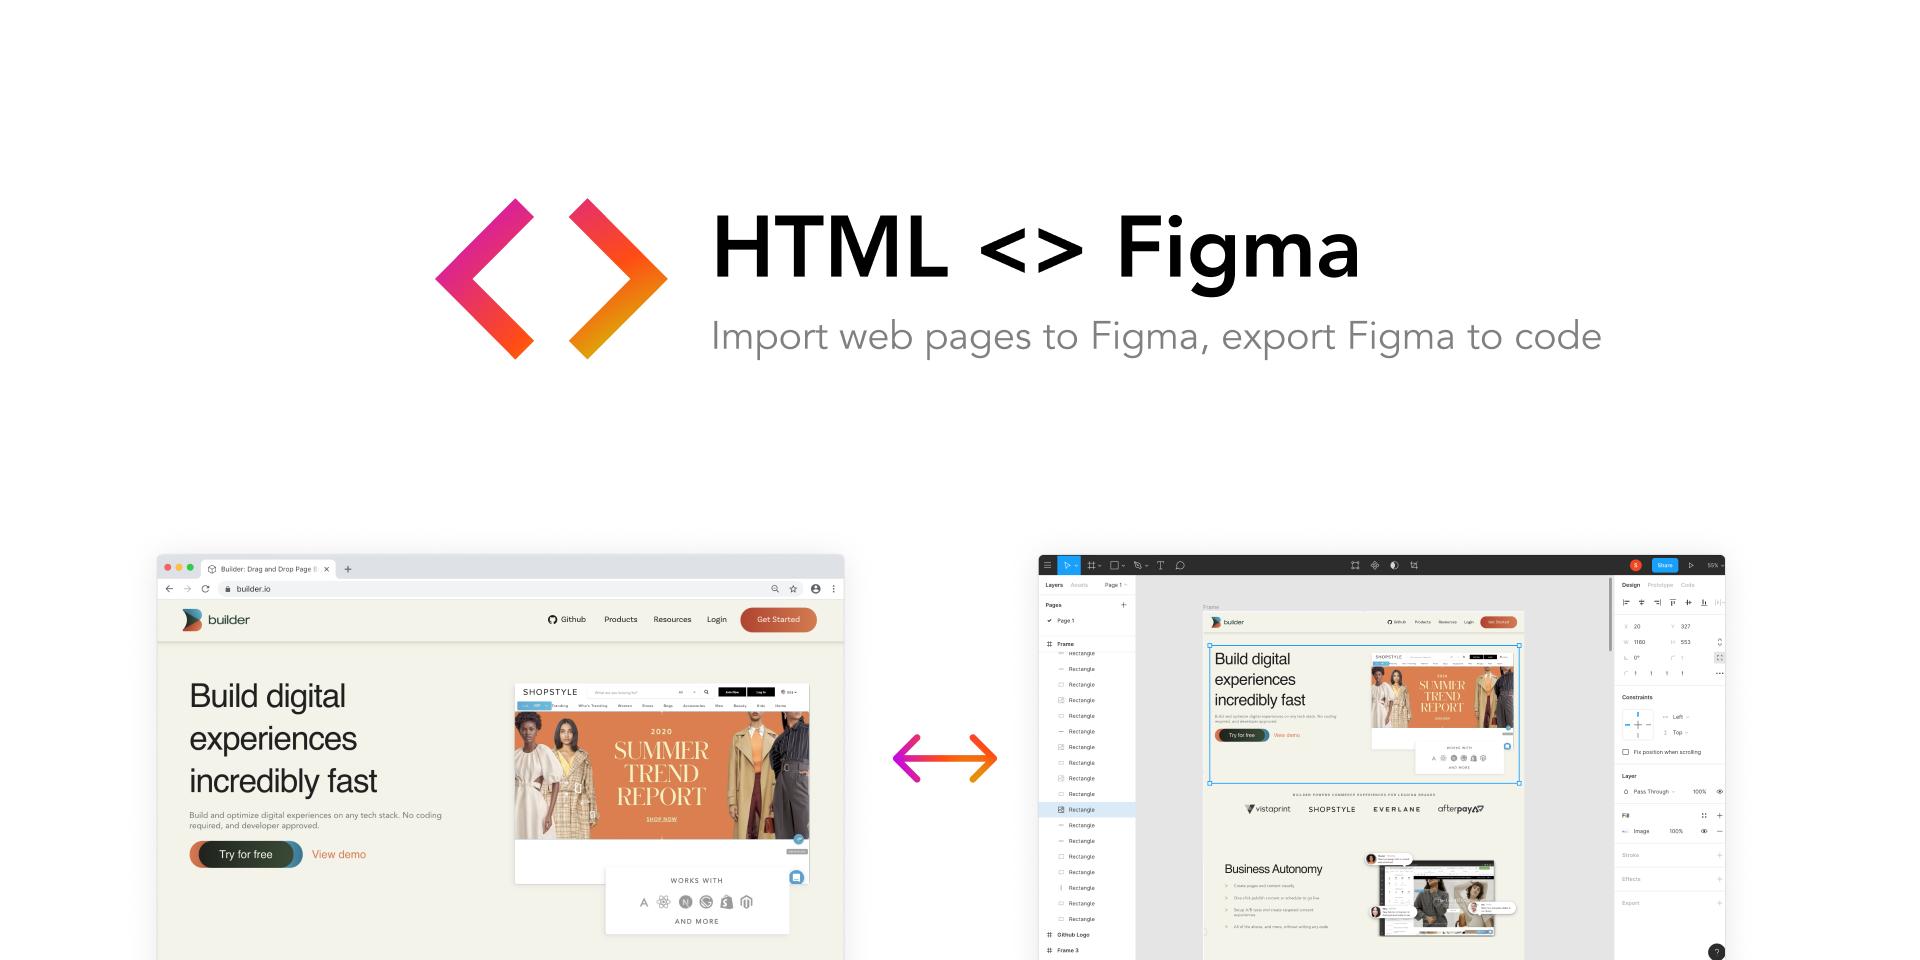 html to figma,saitis damzadeba, საიტის დამზადება, მობილური აპლიკაციის დამზადება, მობილური აპლიკაცია, mobile app, ui/ux